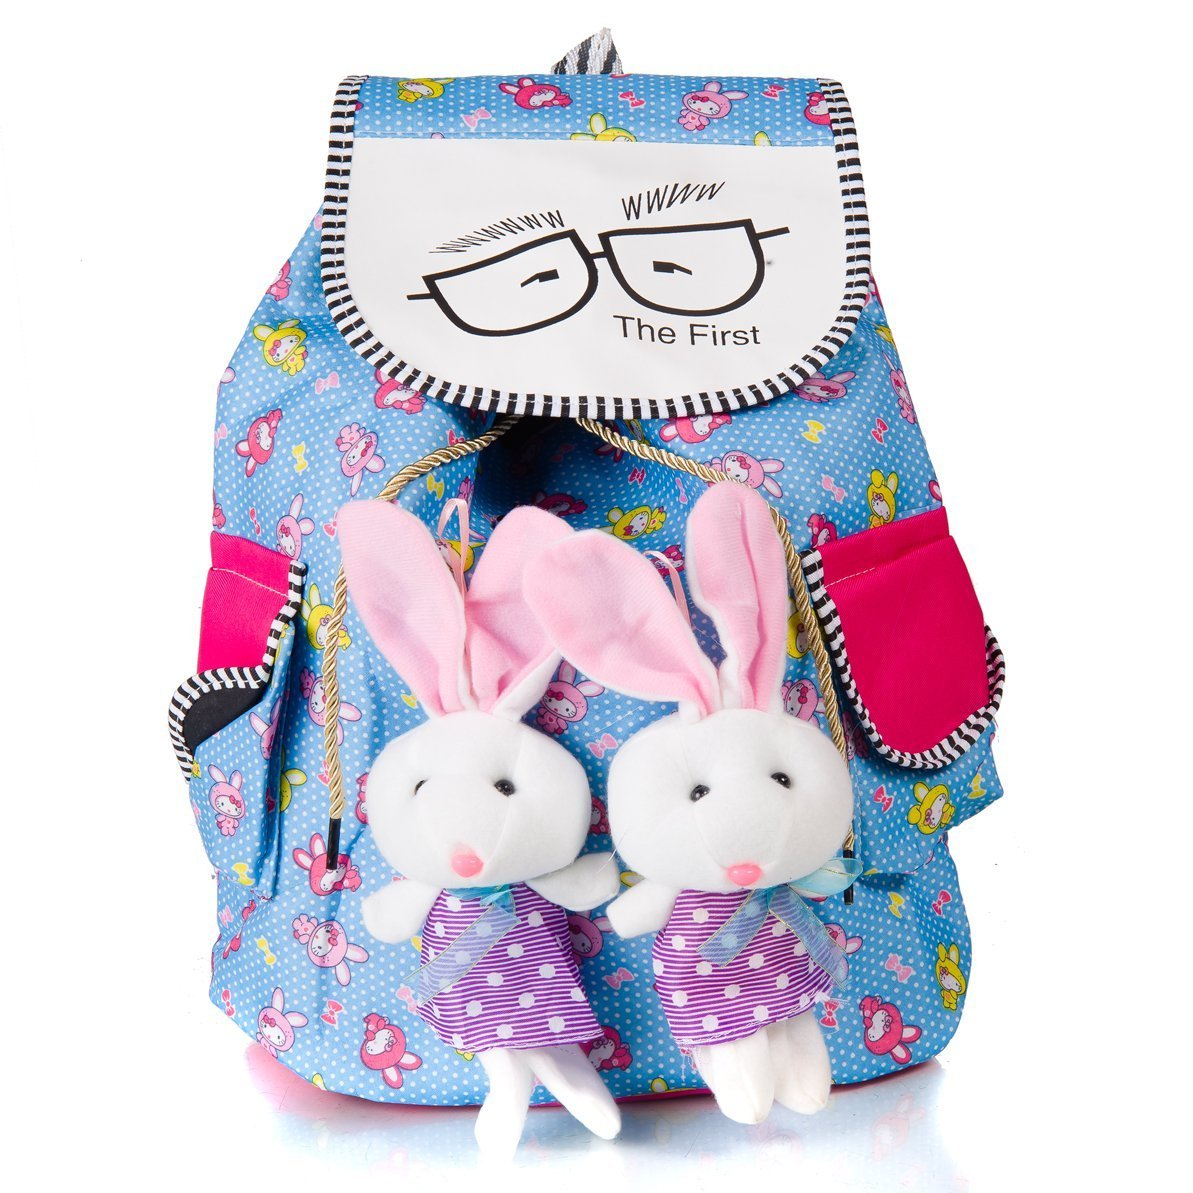 Gracetop Women's Backpack Handbag (Multicolor, Mcb-001)